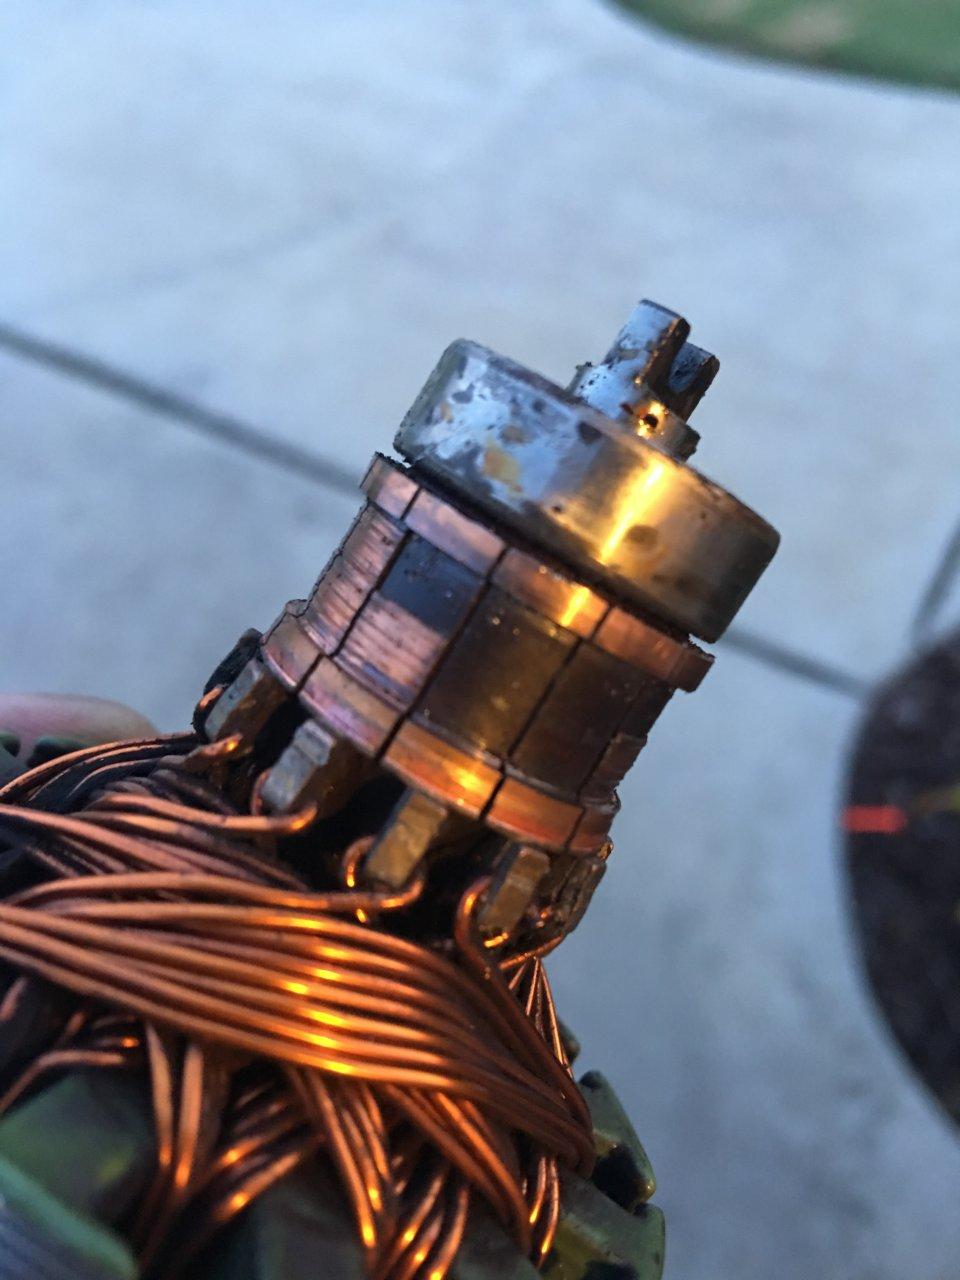 Master Cylinder Replacement >> ABS Modulator - (Master cylinder, Pump/Motor, Accumulator ...